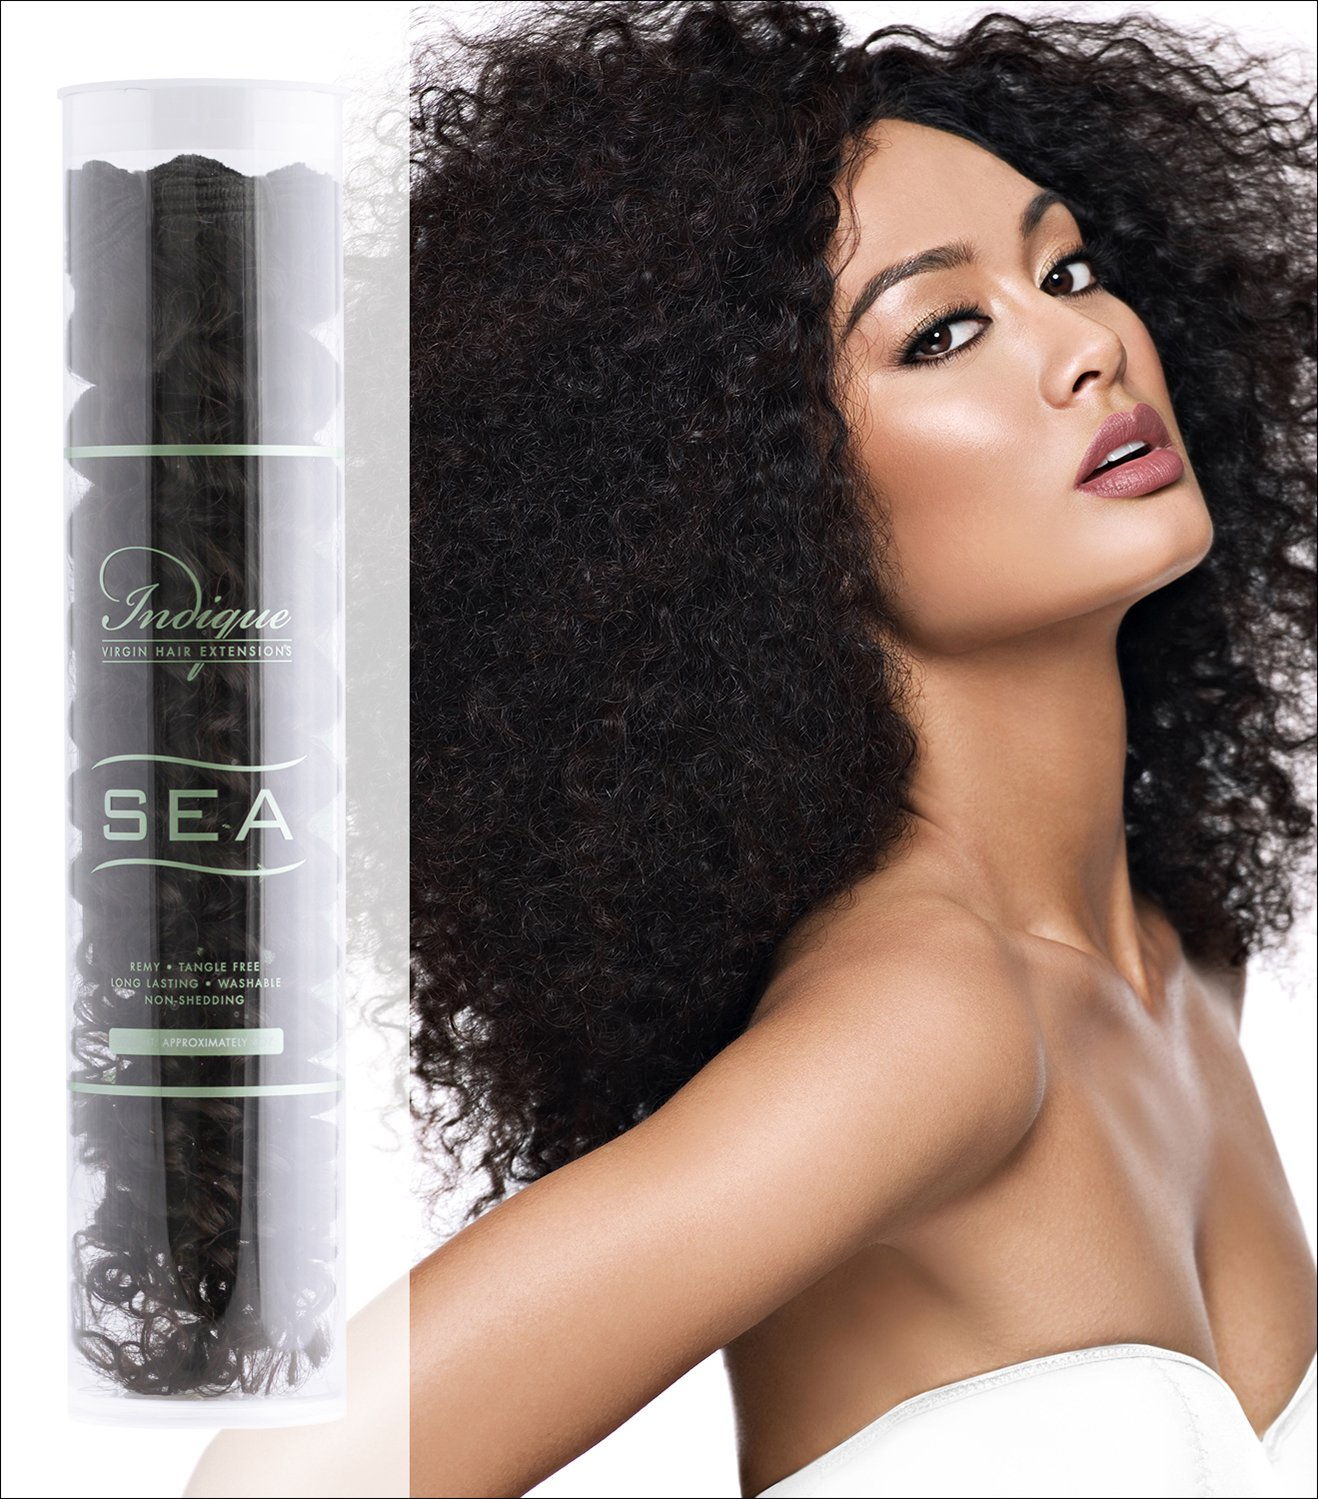 Amazon Indique Virgin Hair Extensions Sea Fiji Curl 12 Inch